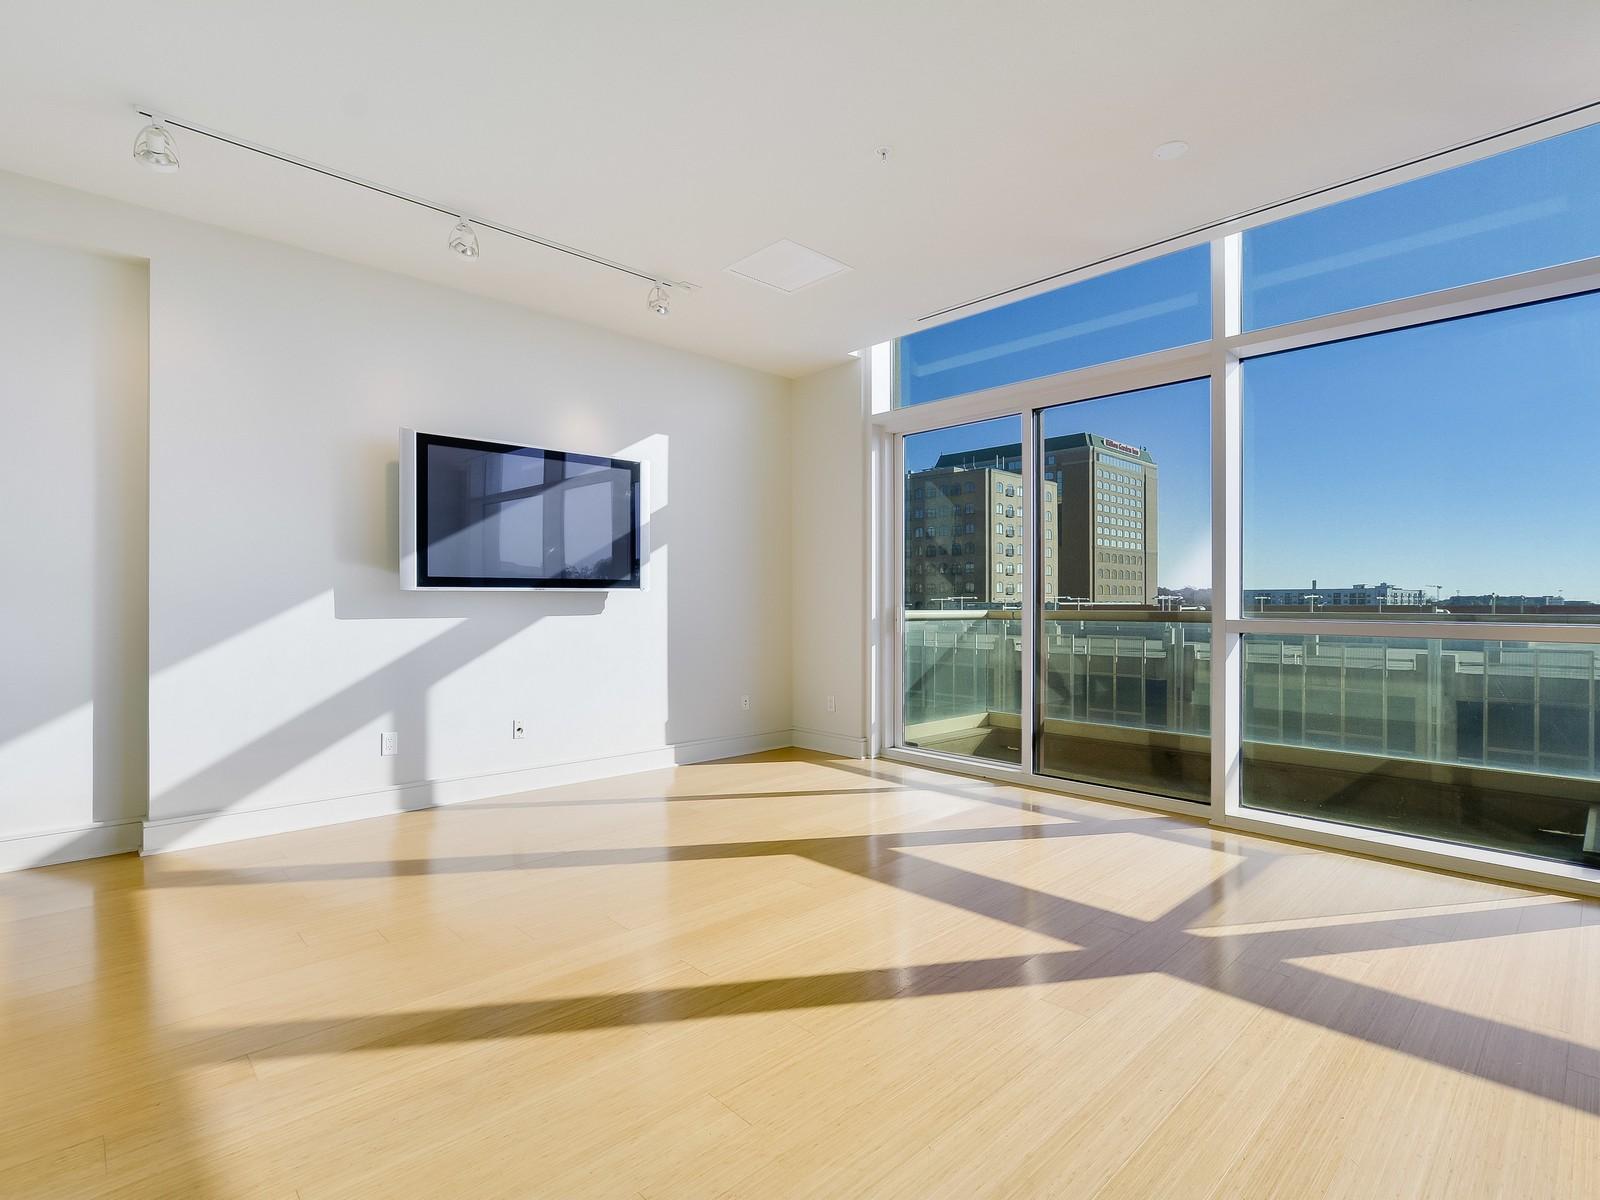 Condominium for Sale at Sophisticated Condo with Premier Floorplan 555 E 5th 527 Austin, Texas 78701 United States